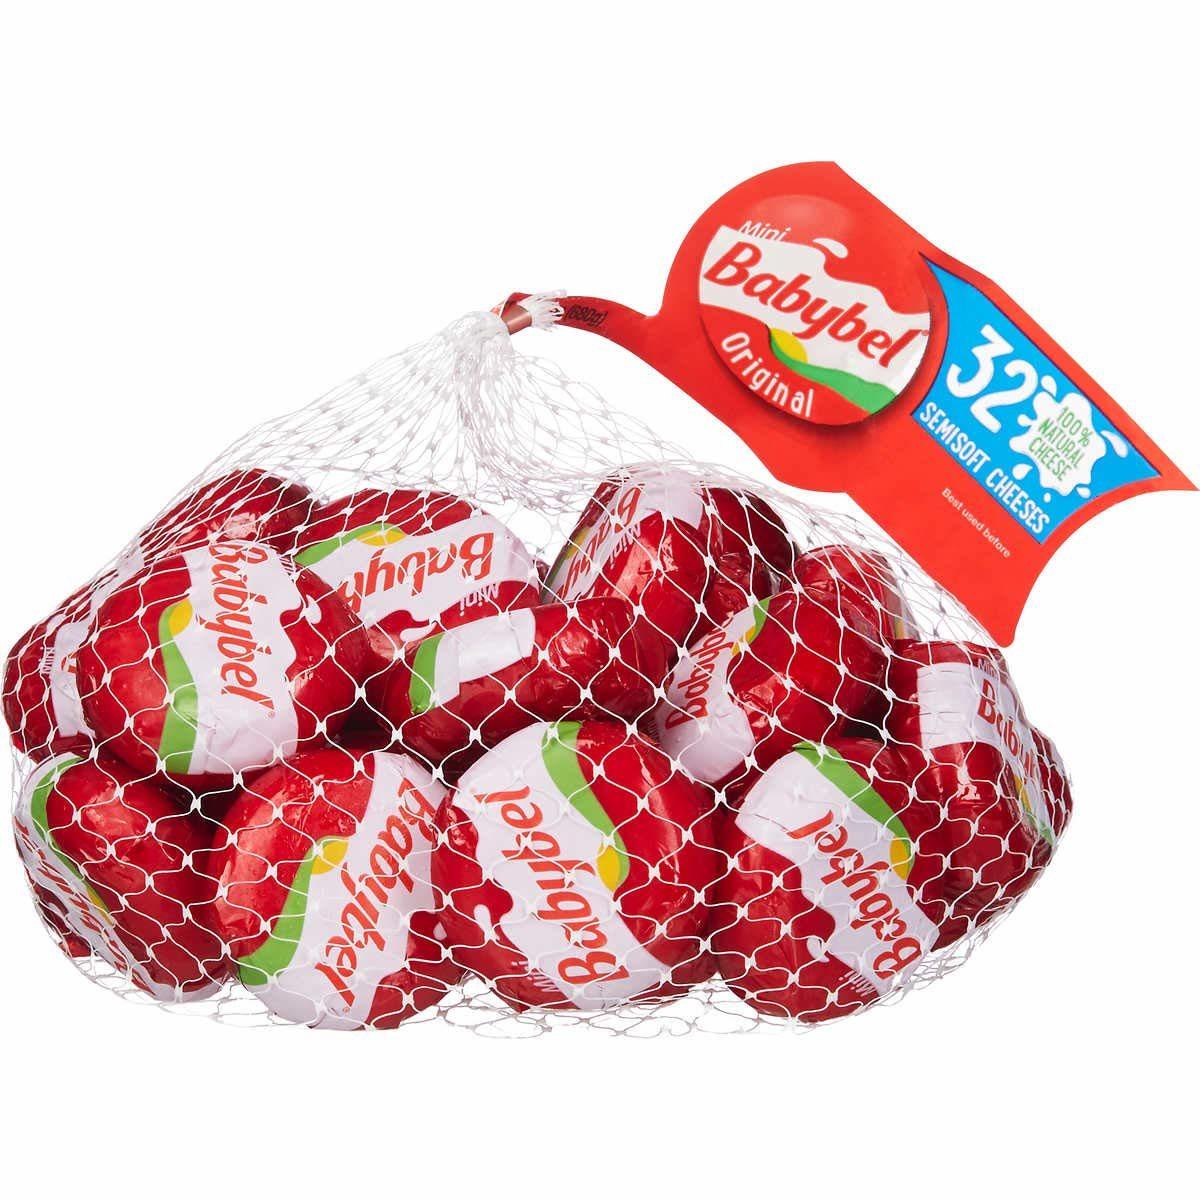 90s snacks australia - babybel